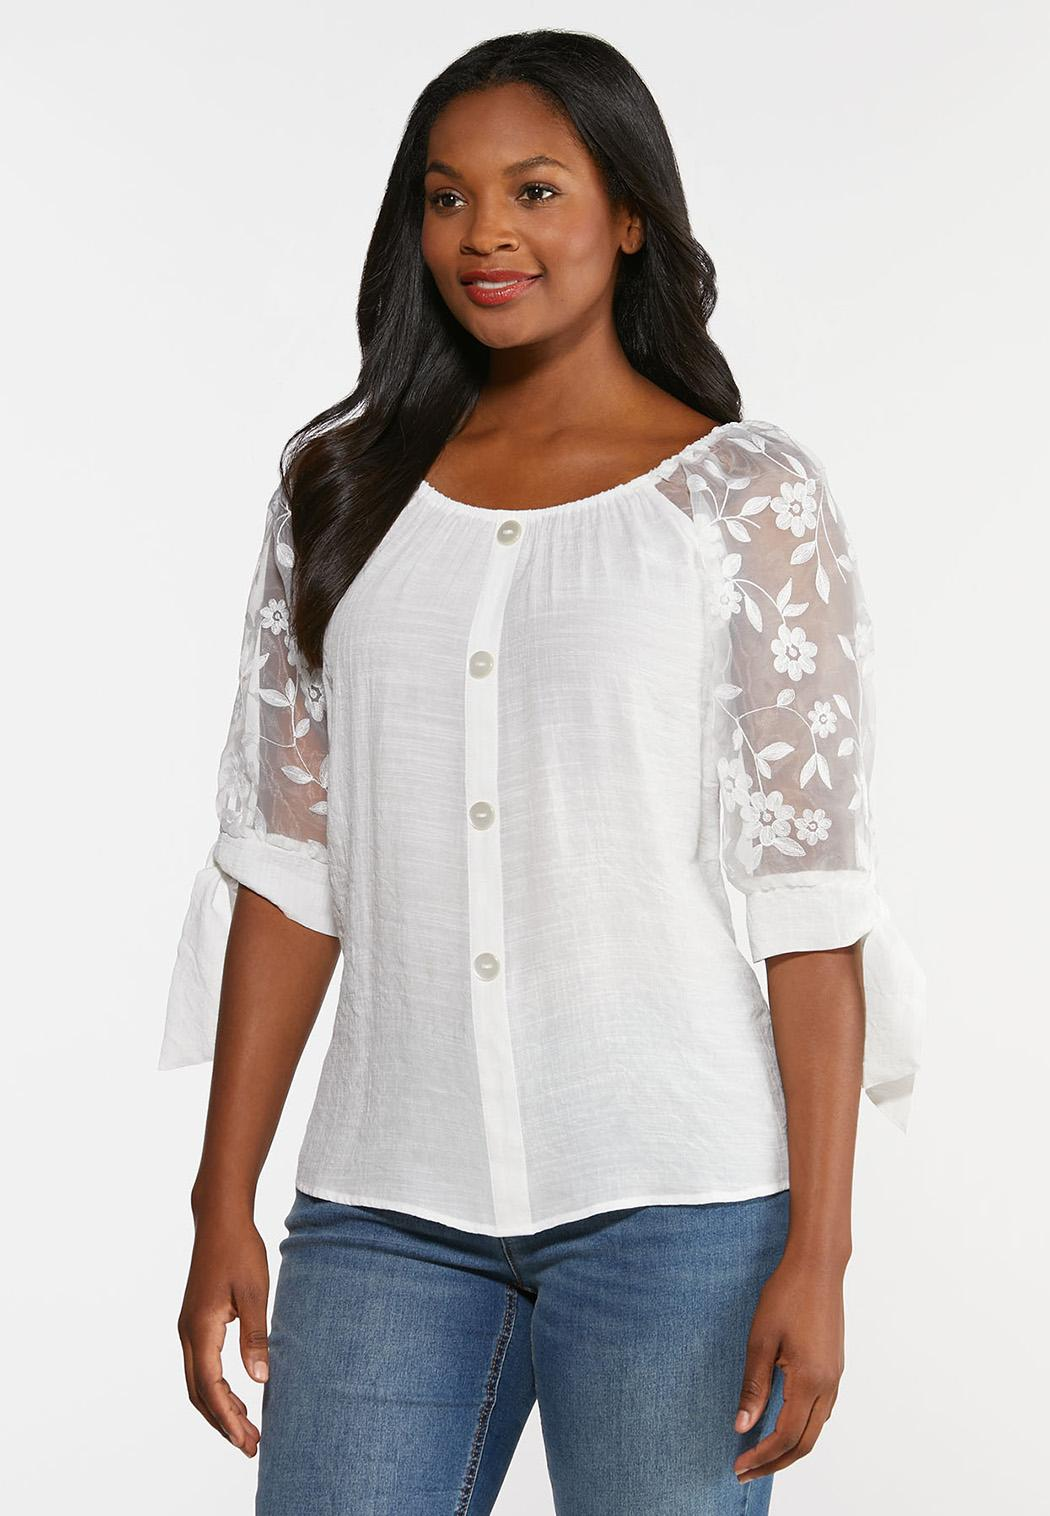 Gauzy Embroidered Sleeve Top